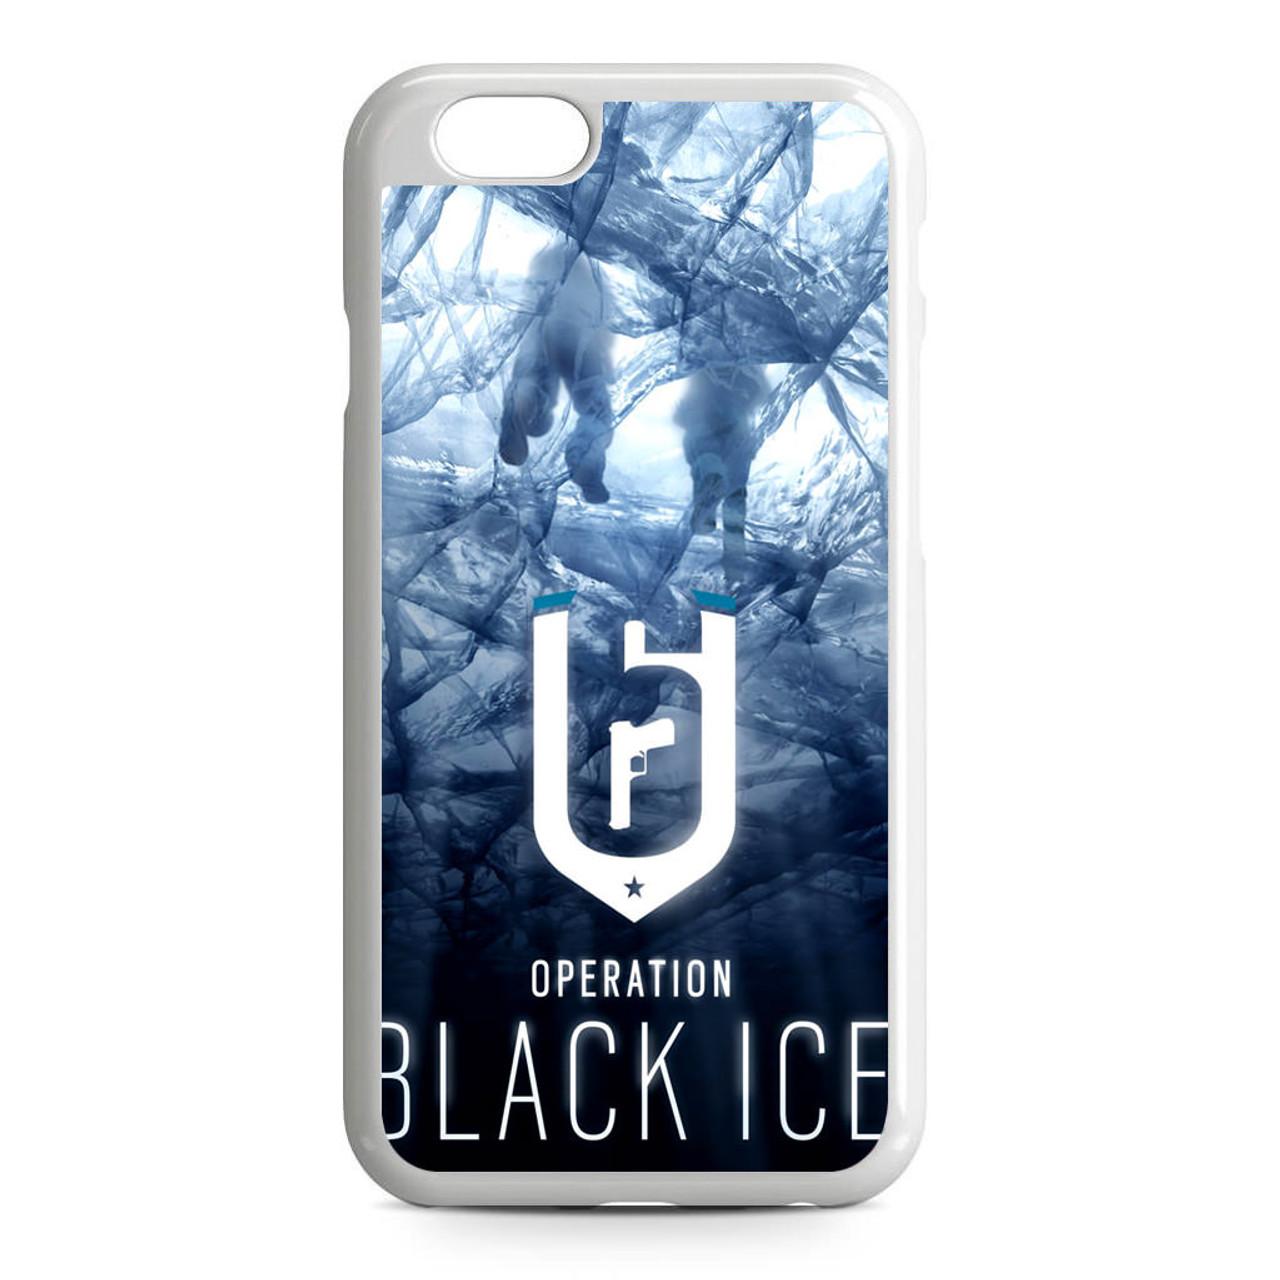 Rainbow Six Siege Operation Black Ice iPhone 6/6S Case